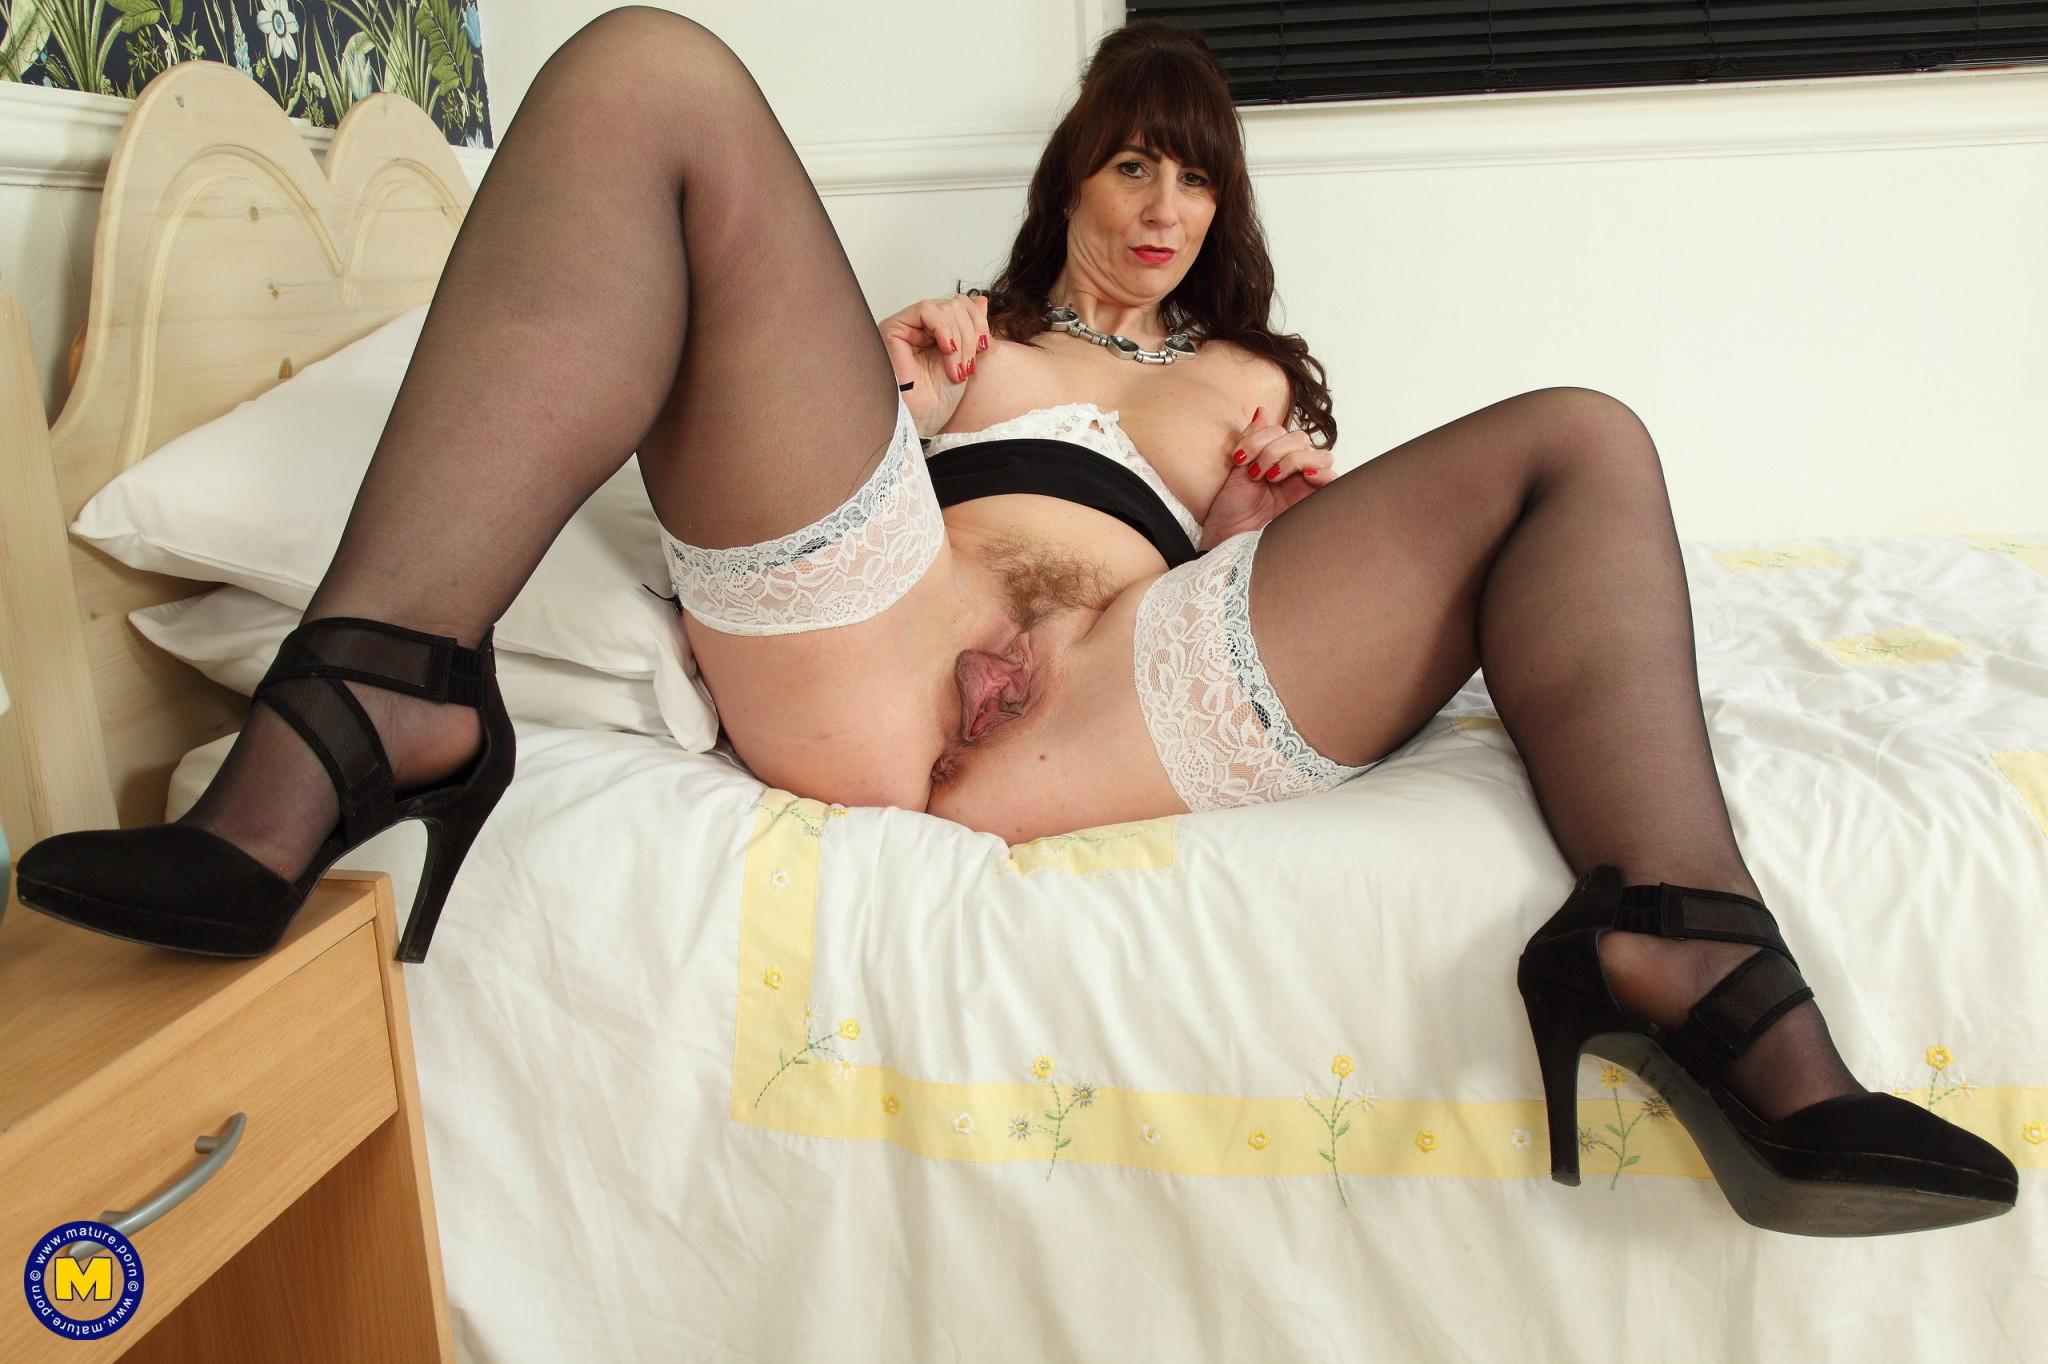 Garrys girls toni lace photosxxx stockings naked party sex hq pics